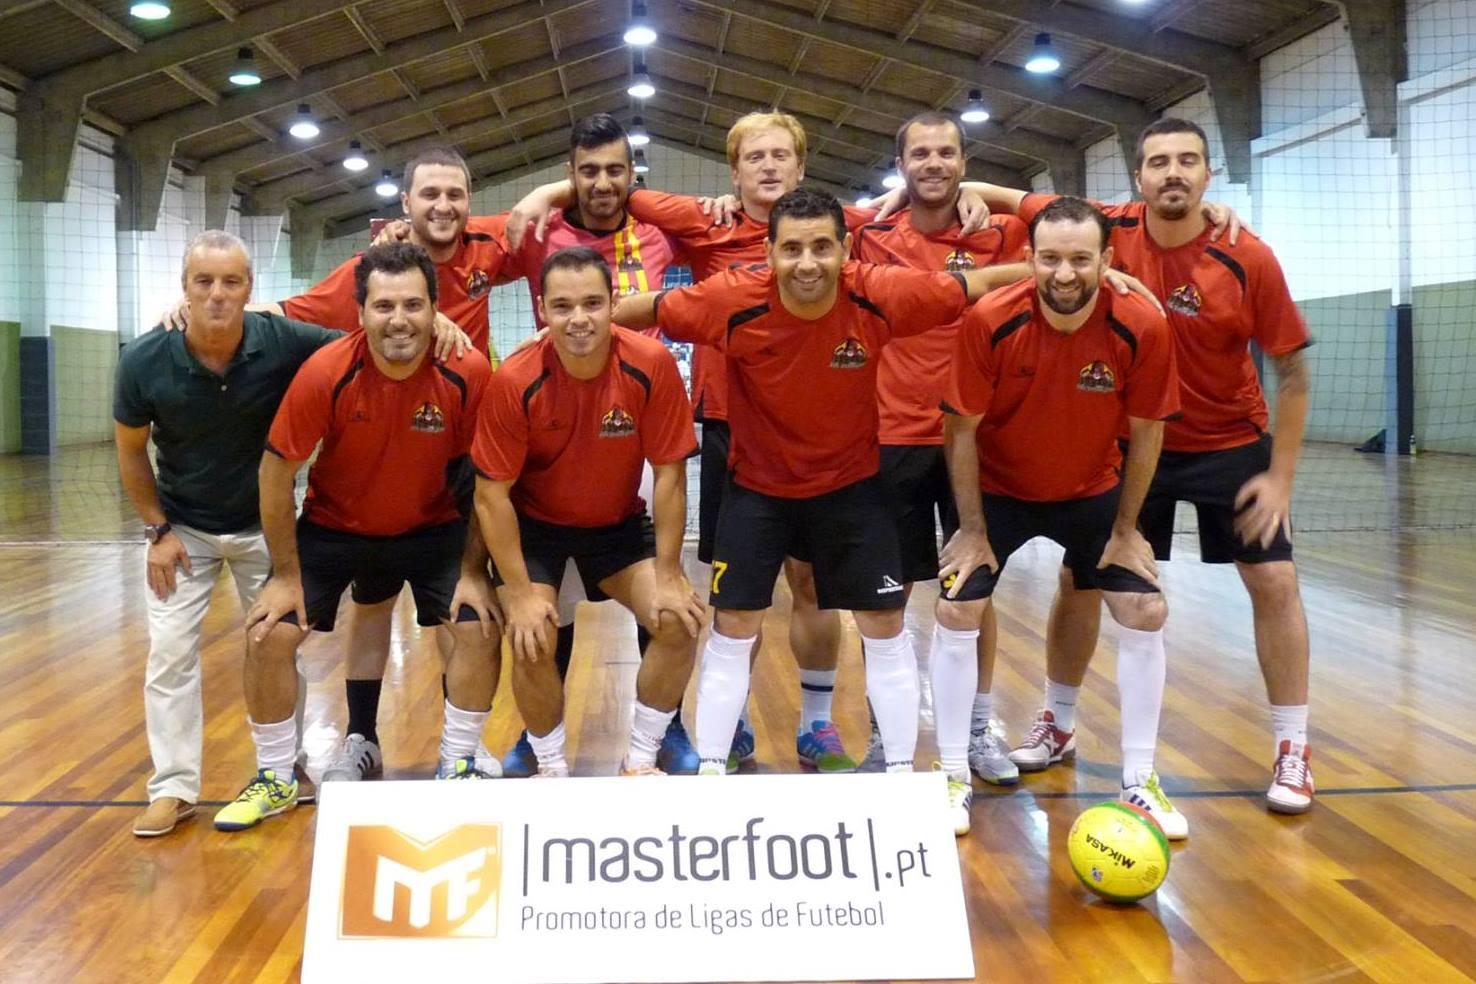 CAMPEÃO da 5ª Super Liga Masterfoot